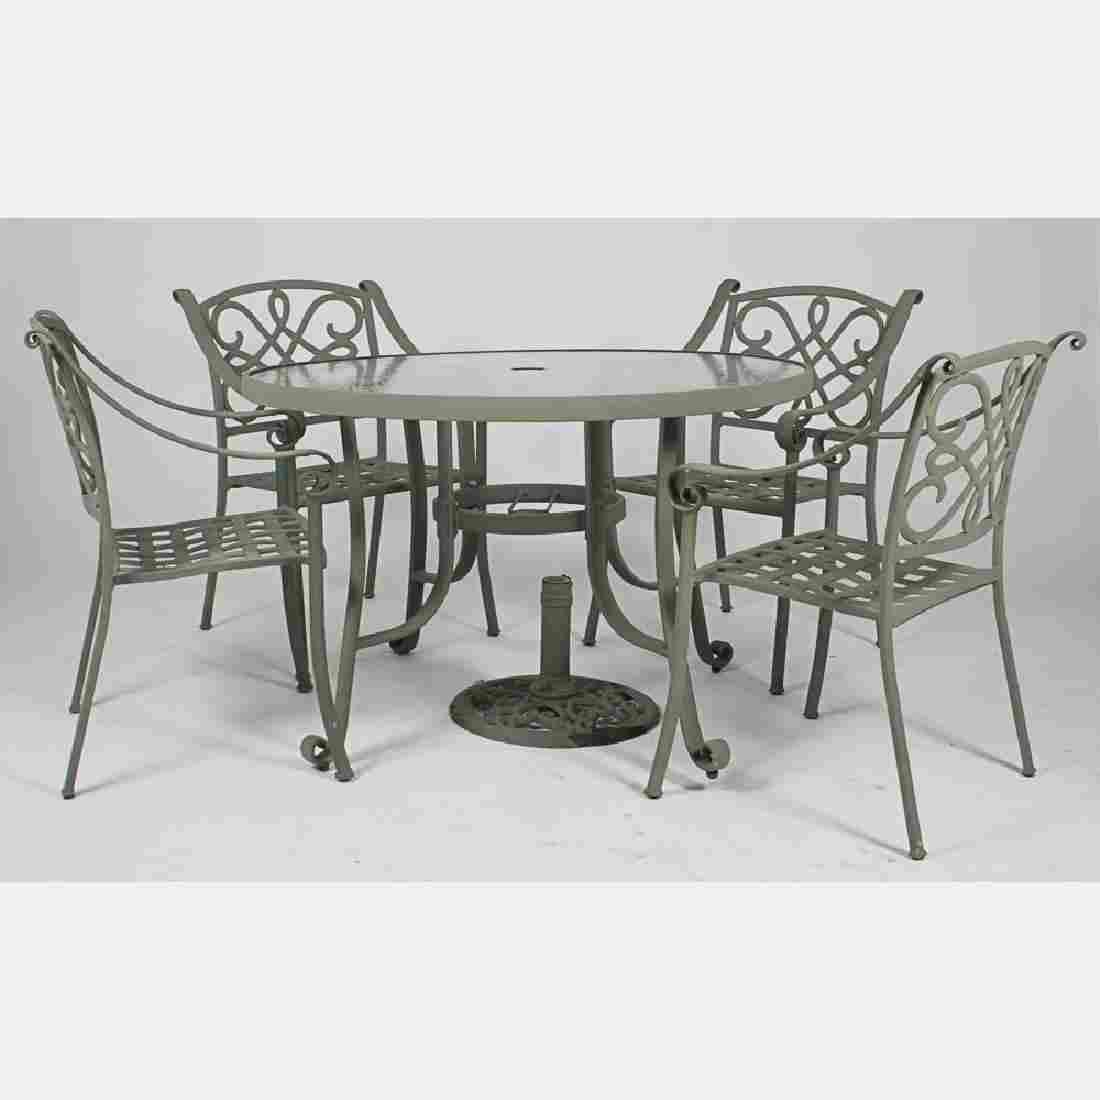 A Contemporary Cast Aluminum Garden Set, 20th Century,